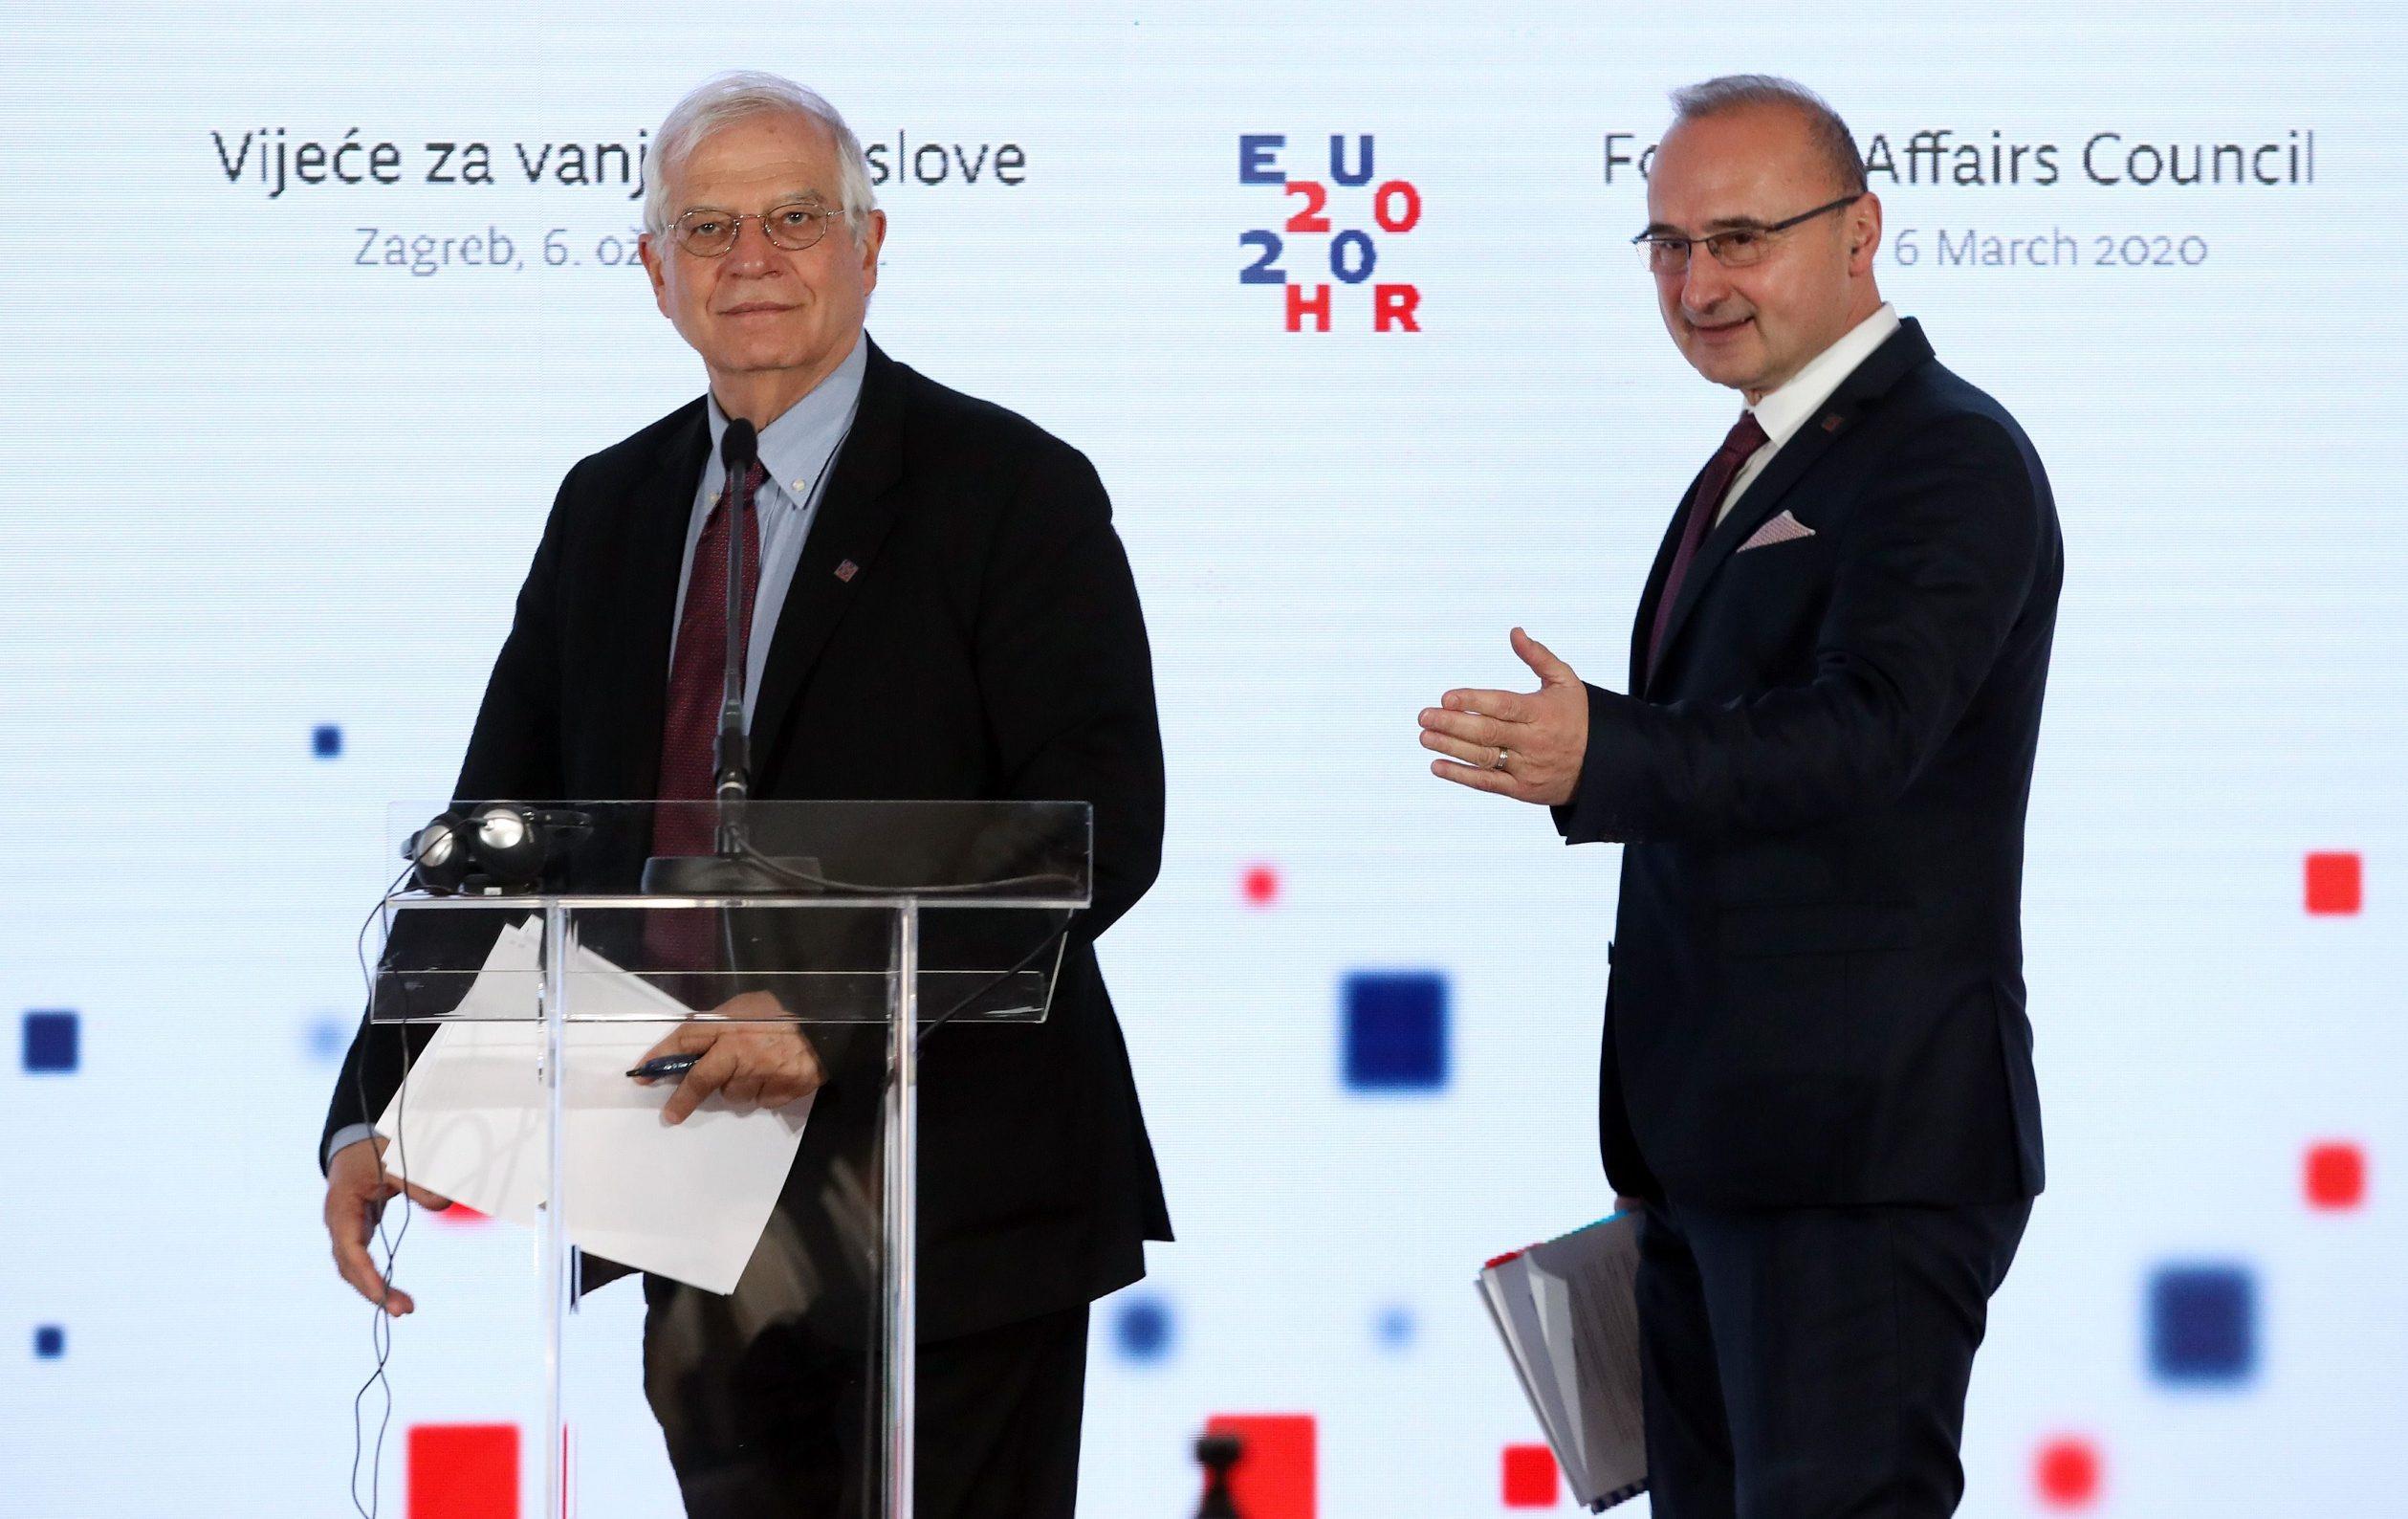 High Representative of the European Union Josep Borrell Fontelles (L) and Croatian Foreign Minister Gordan Grlić Radman